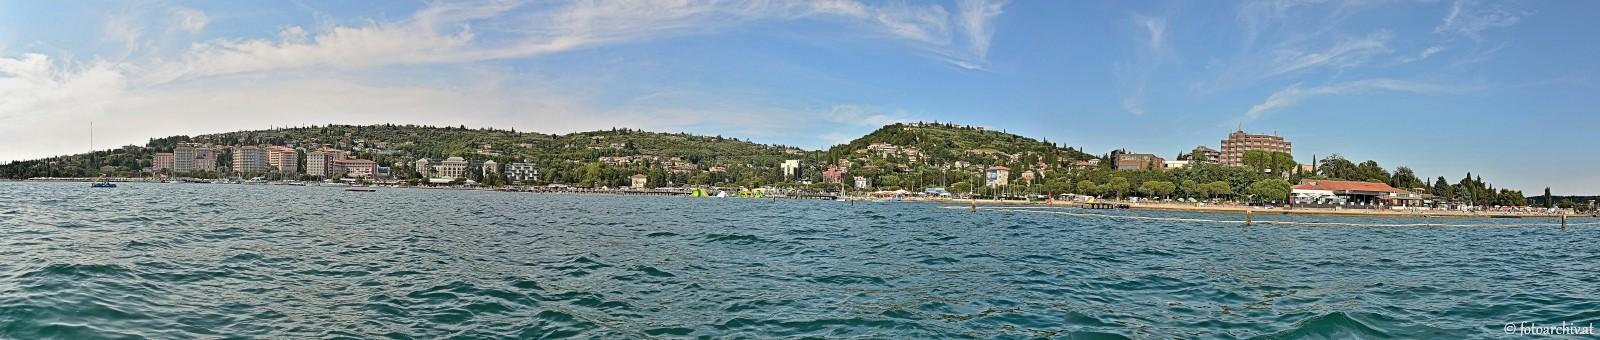 Portoroz/Slowenien 2015 - Nikon D5100